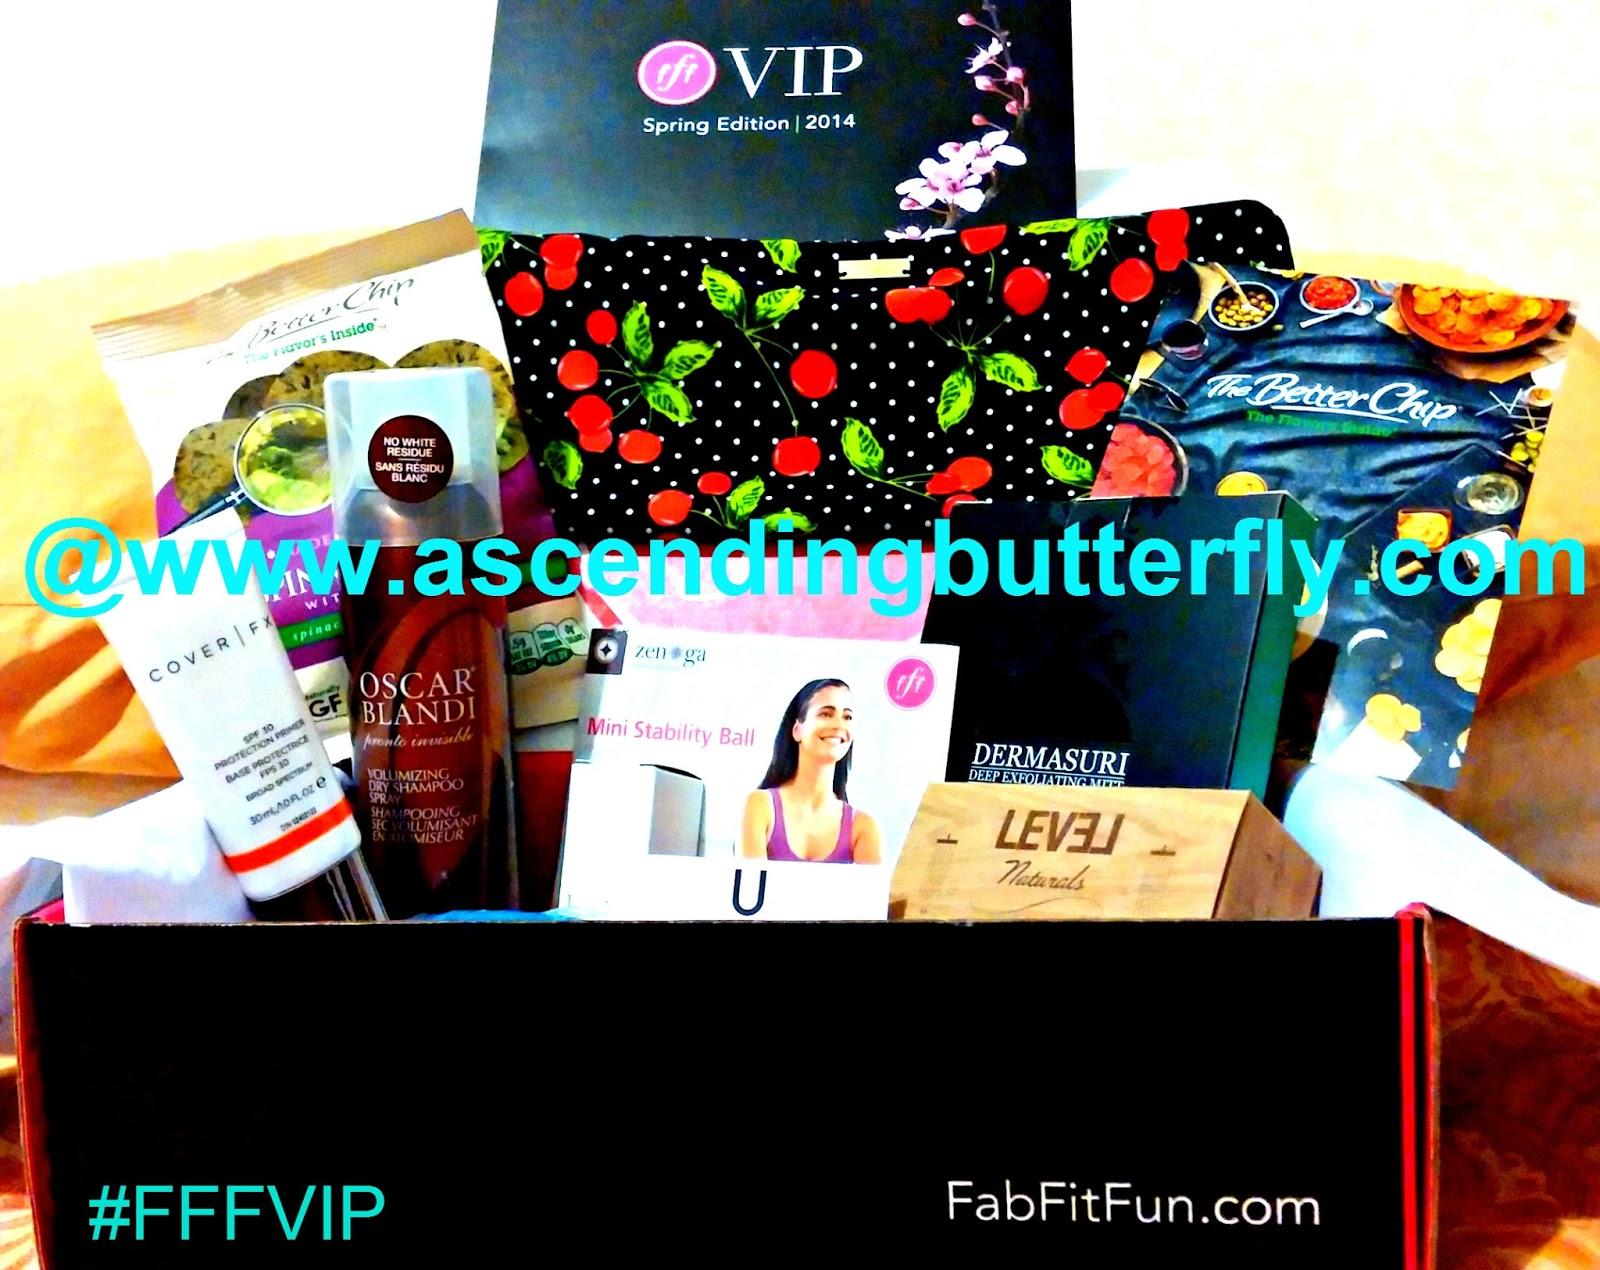 Spring 2014 FabFitFun Box